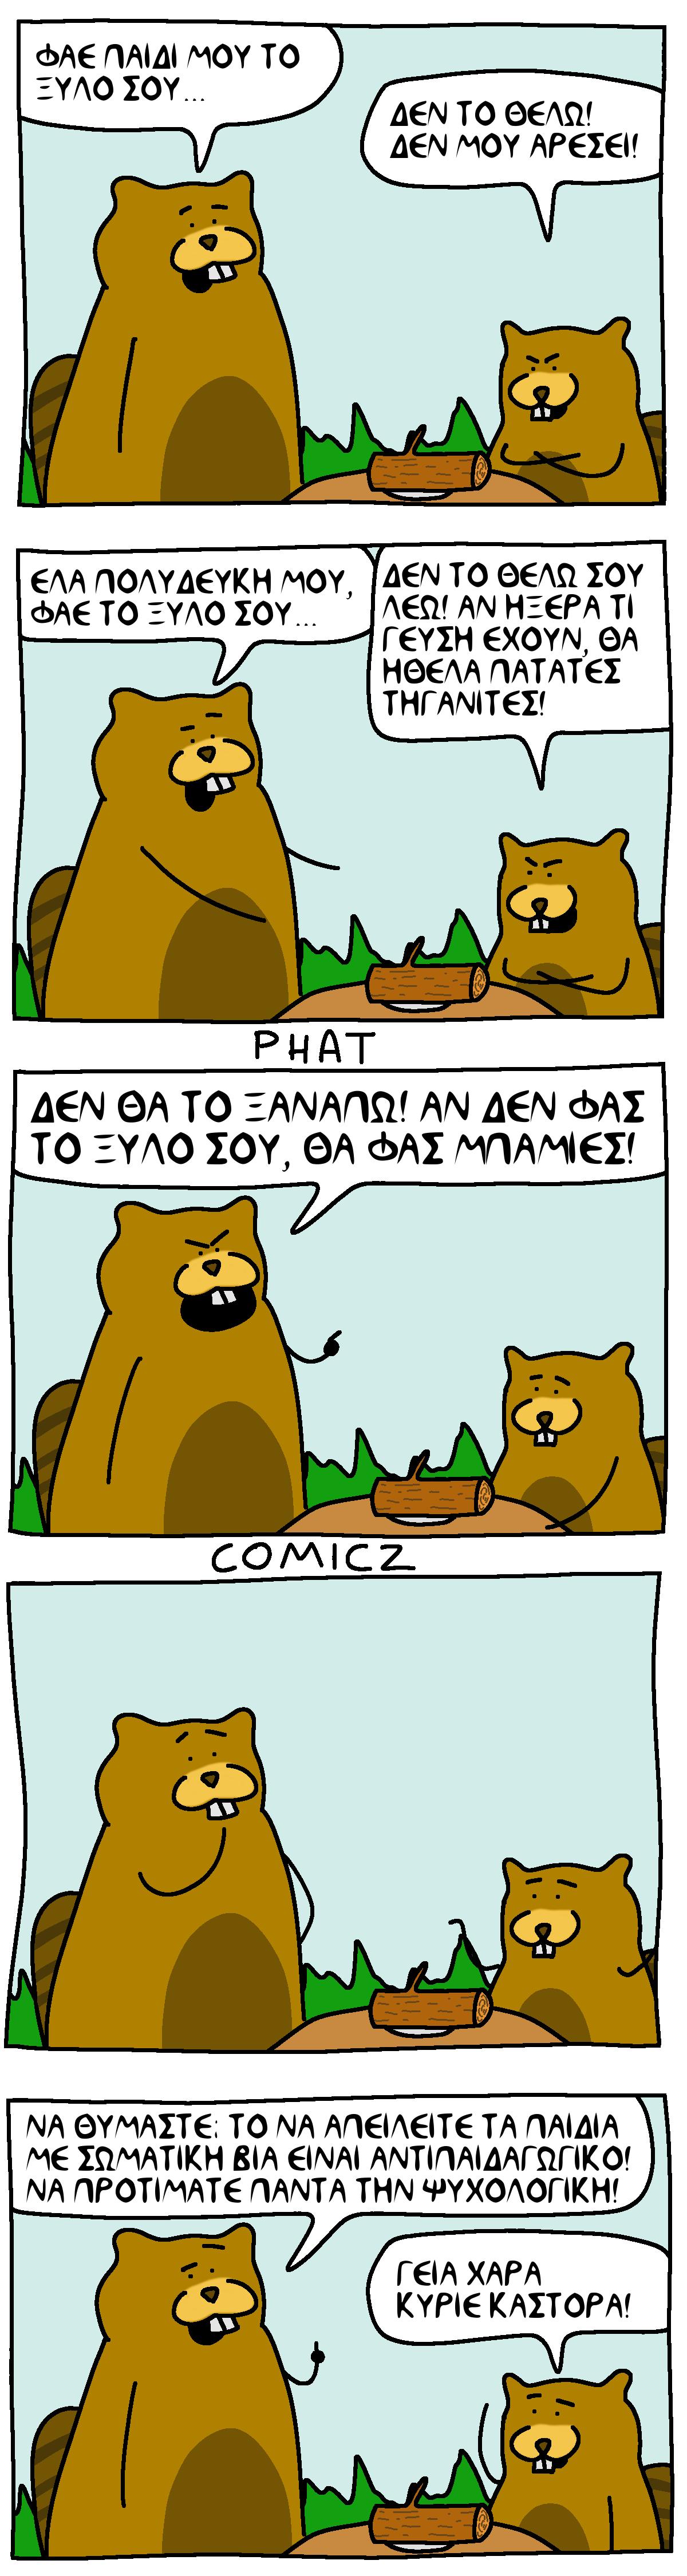 kastoras